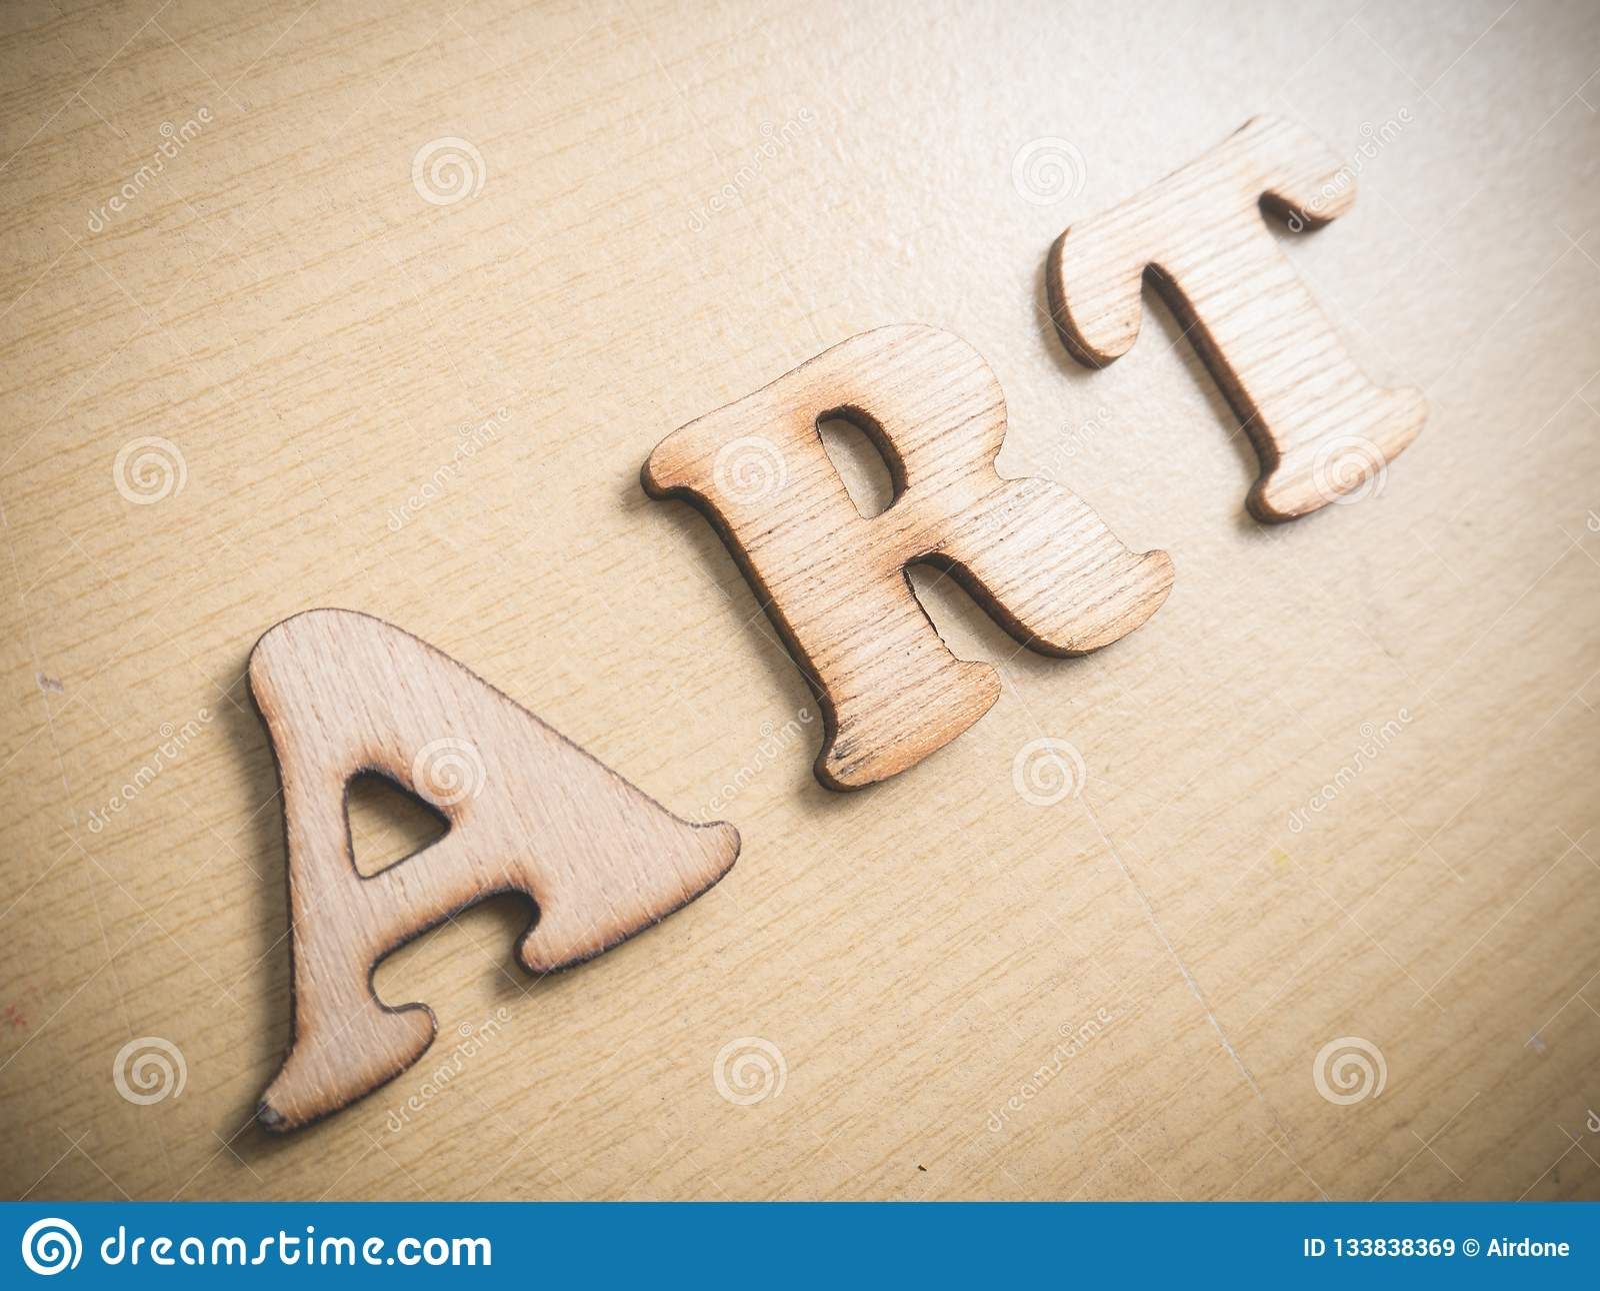 Art Motivational Words Quotes Concept